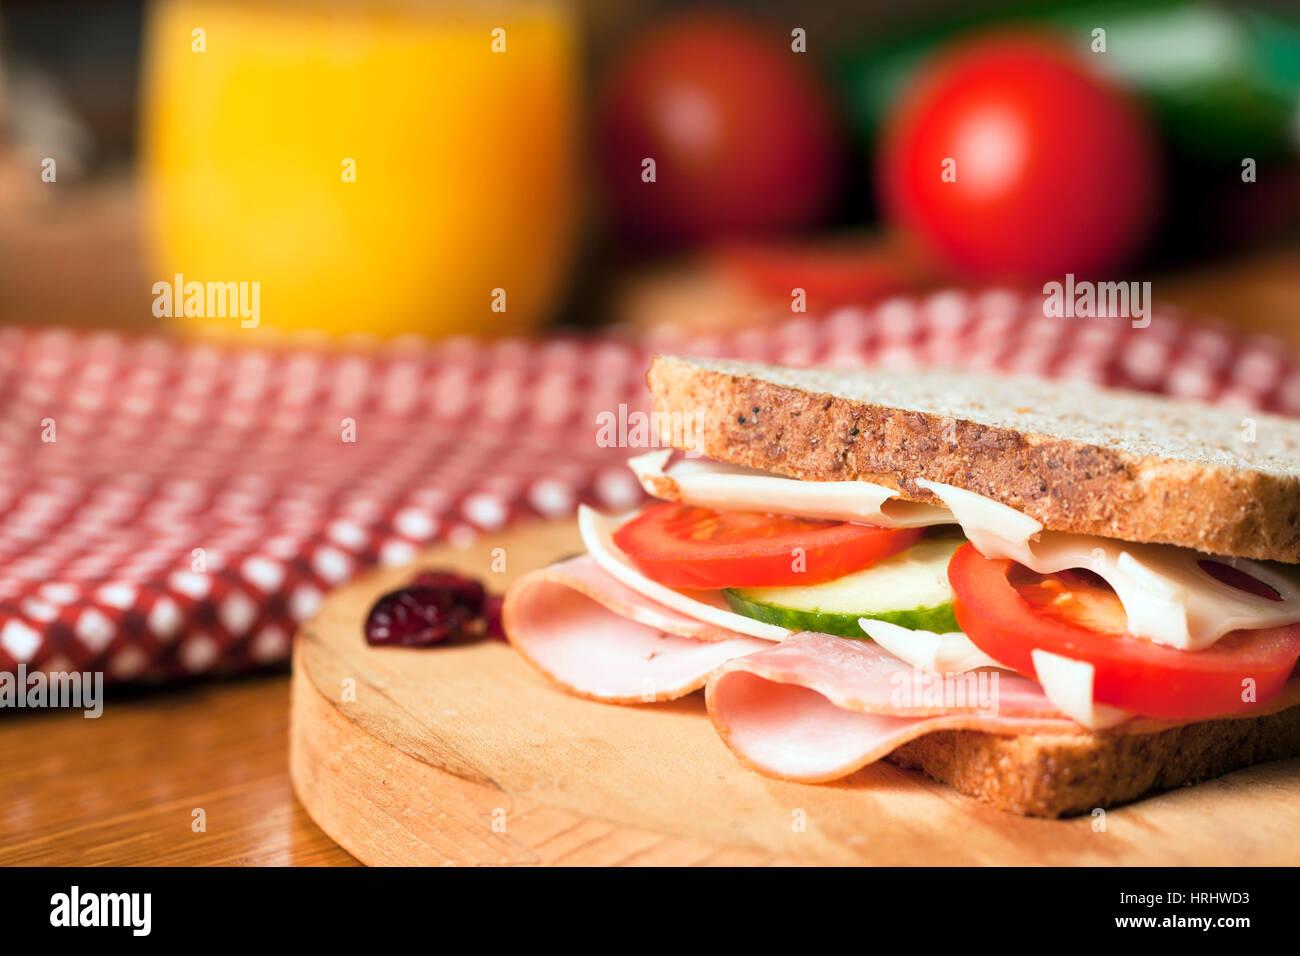 Healthy sandwich - Stock Image